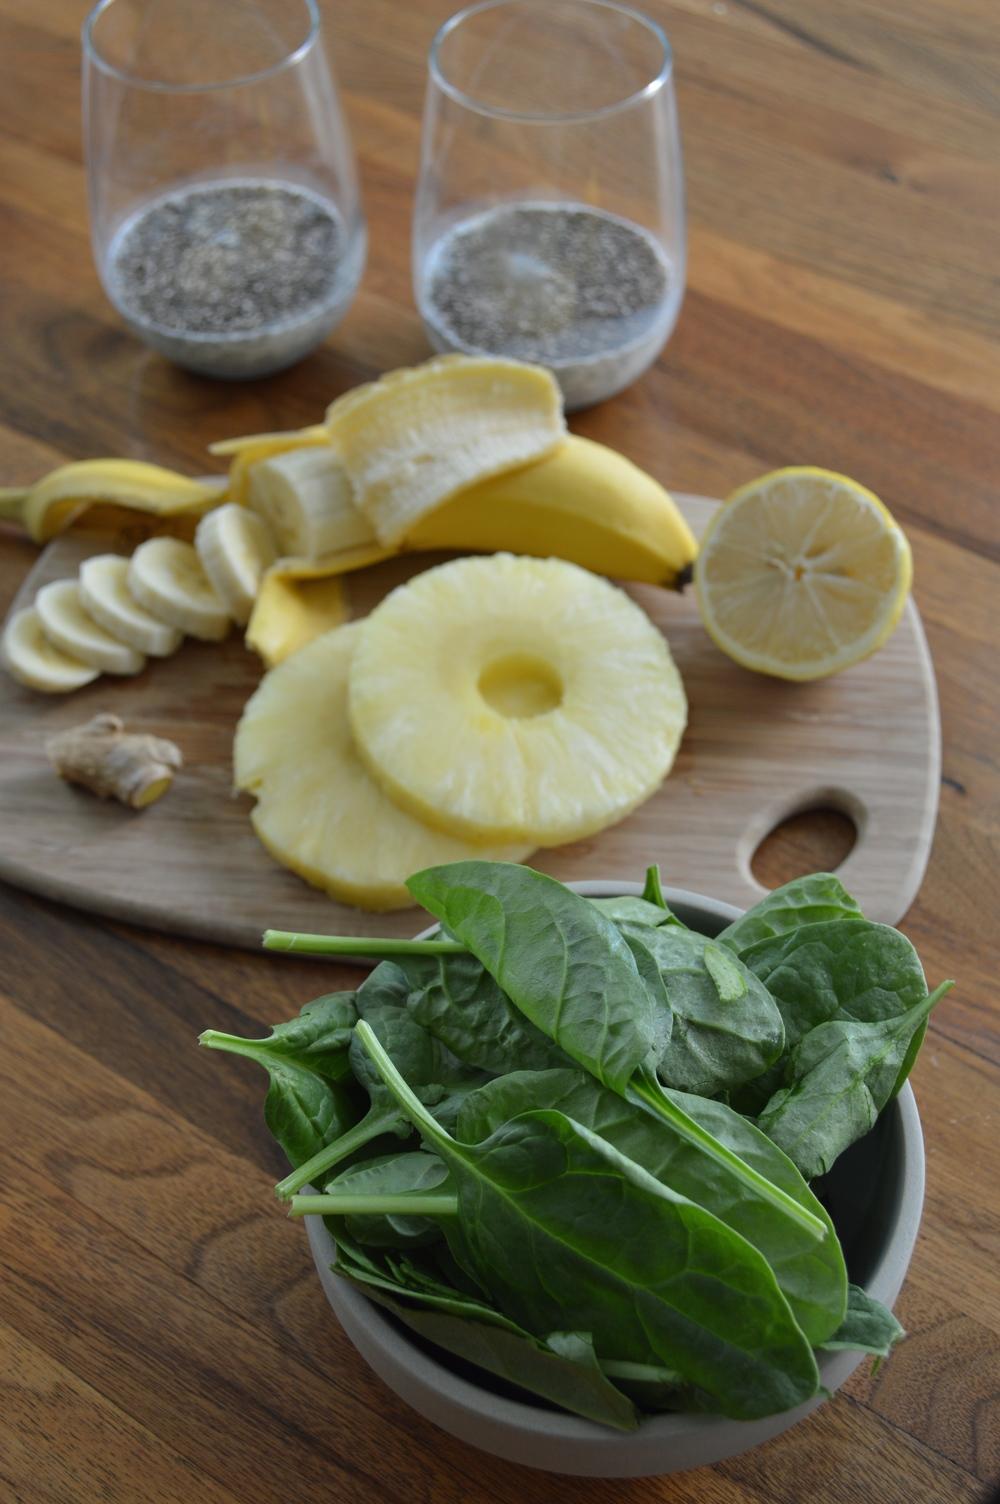 Lauren-Schwaiger-Blog-Green-Smoothie-Ingredients.jpg